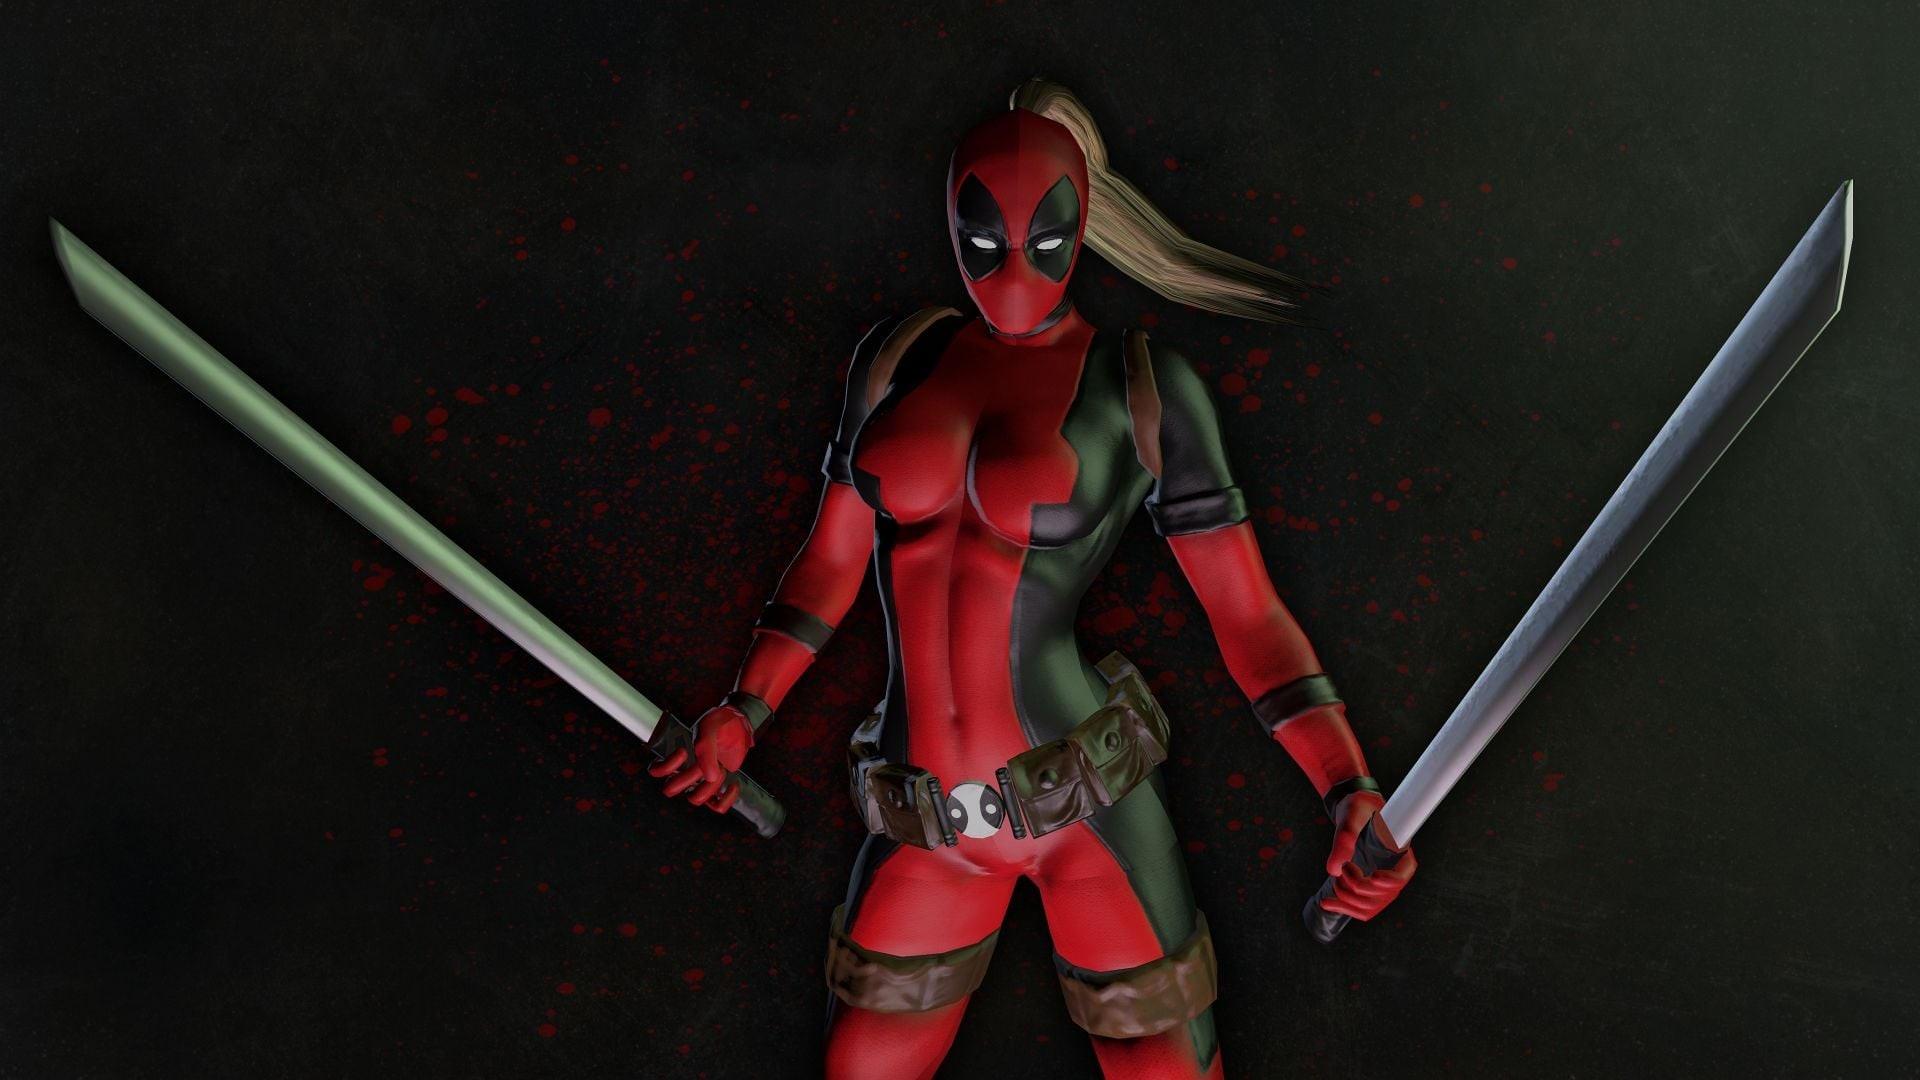 Deadpool Wallpaper 76 Pictures